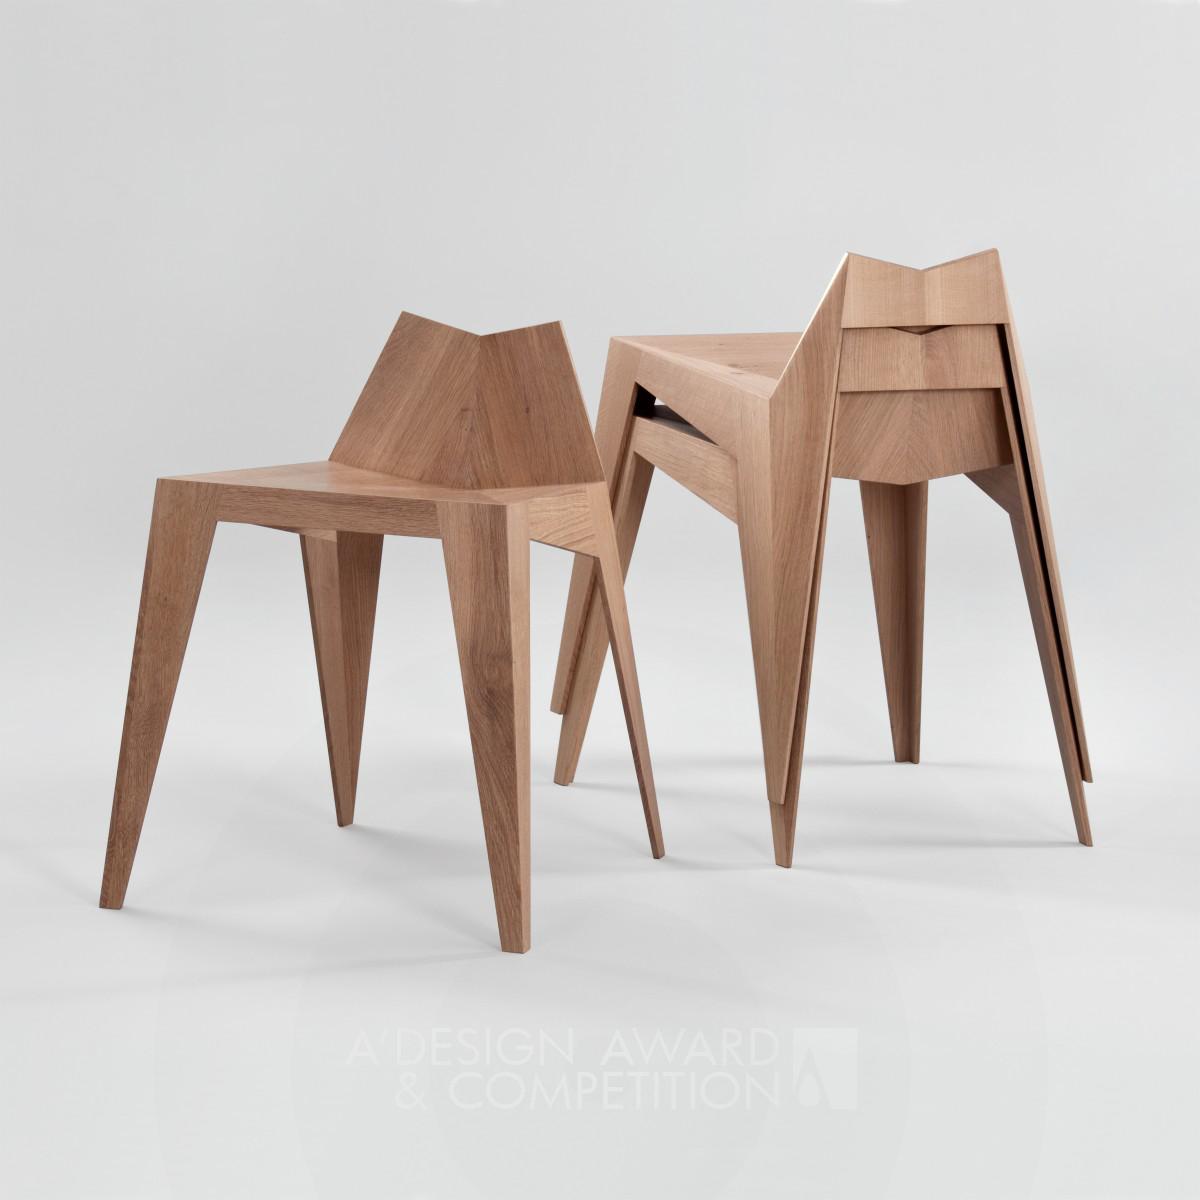 Stocker Chair, Stool